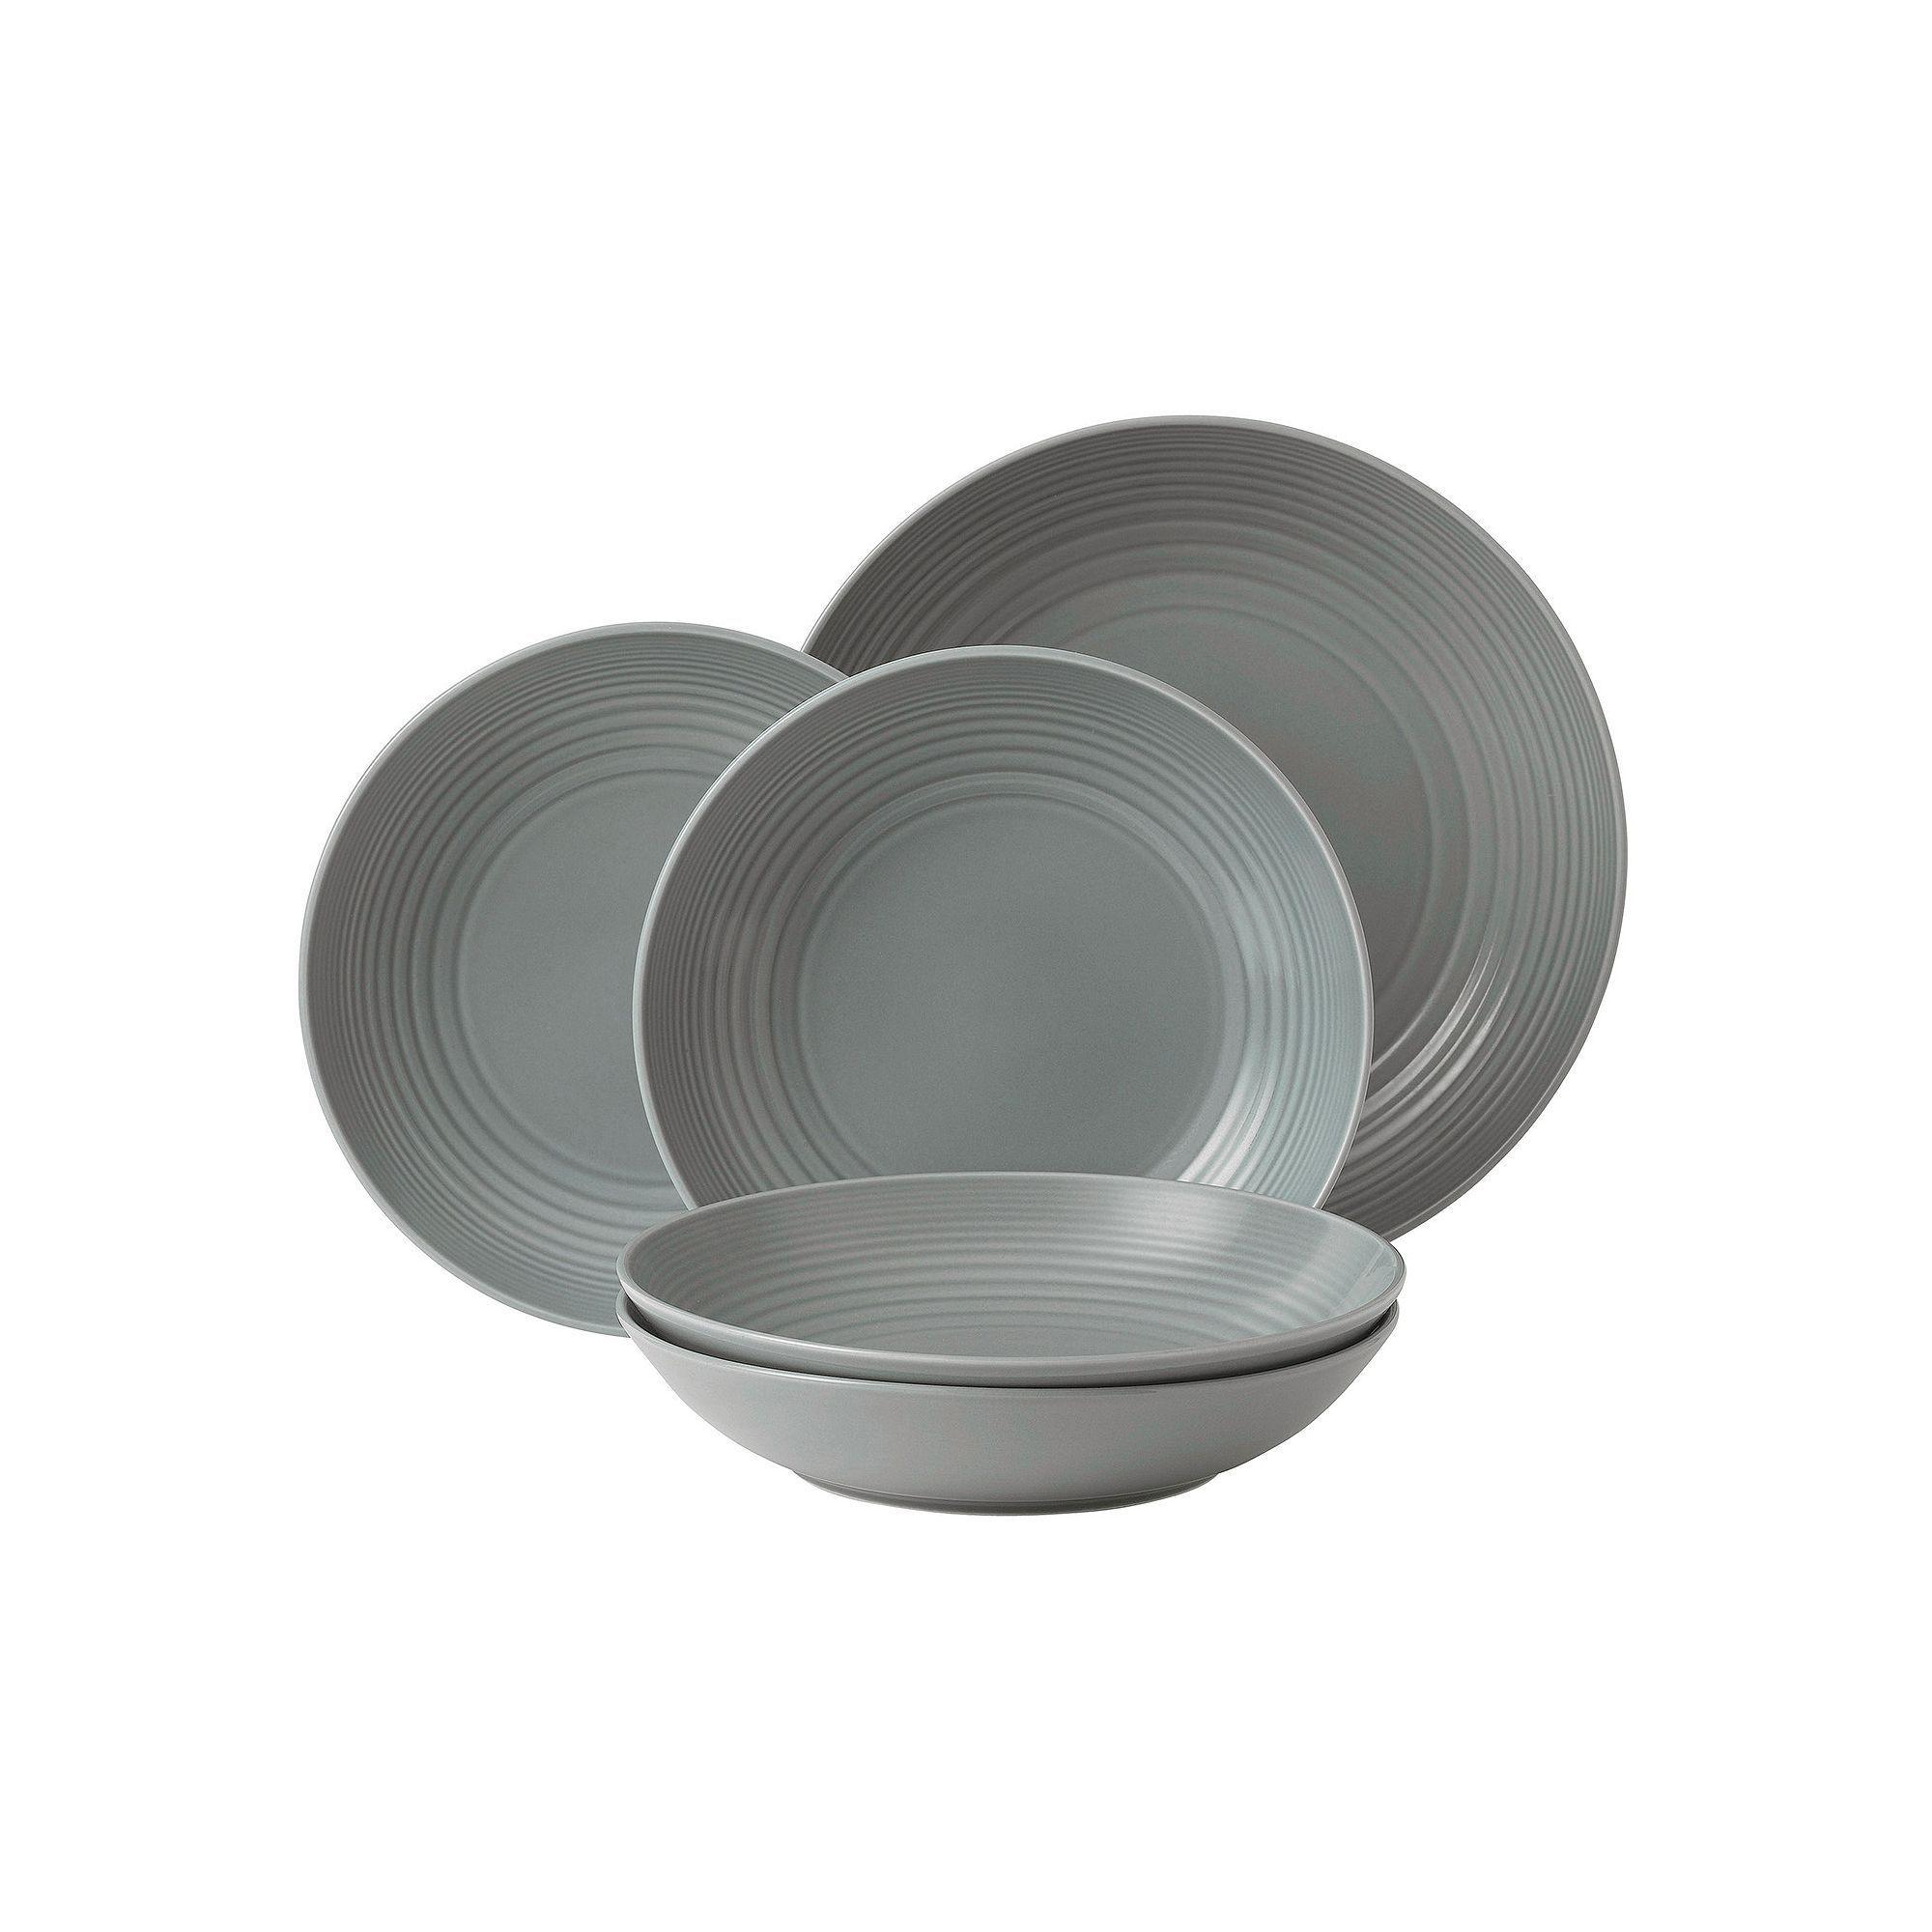 Dinnerware · Royal Doulton Gordon Ramsay ...  sc 1 st  Pinterest & Royal Doulton Gordon Ramsay Maze 5-pc. Pasta Bowl Set Dark Grey ...